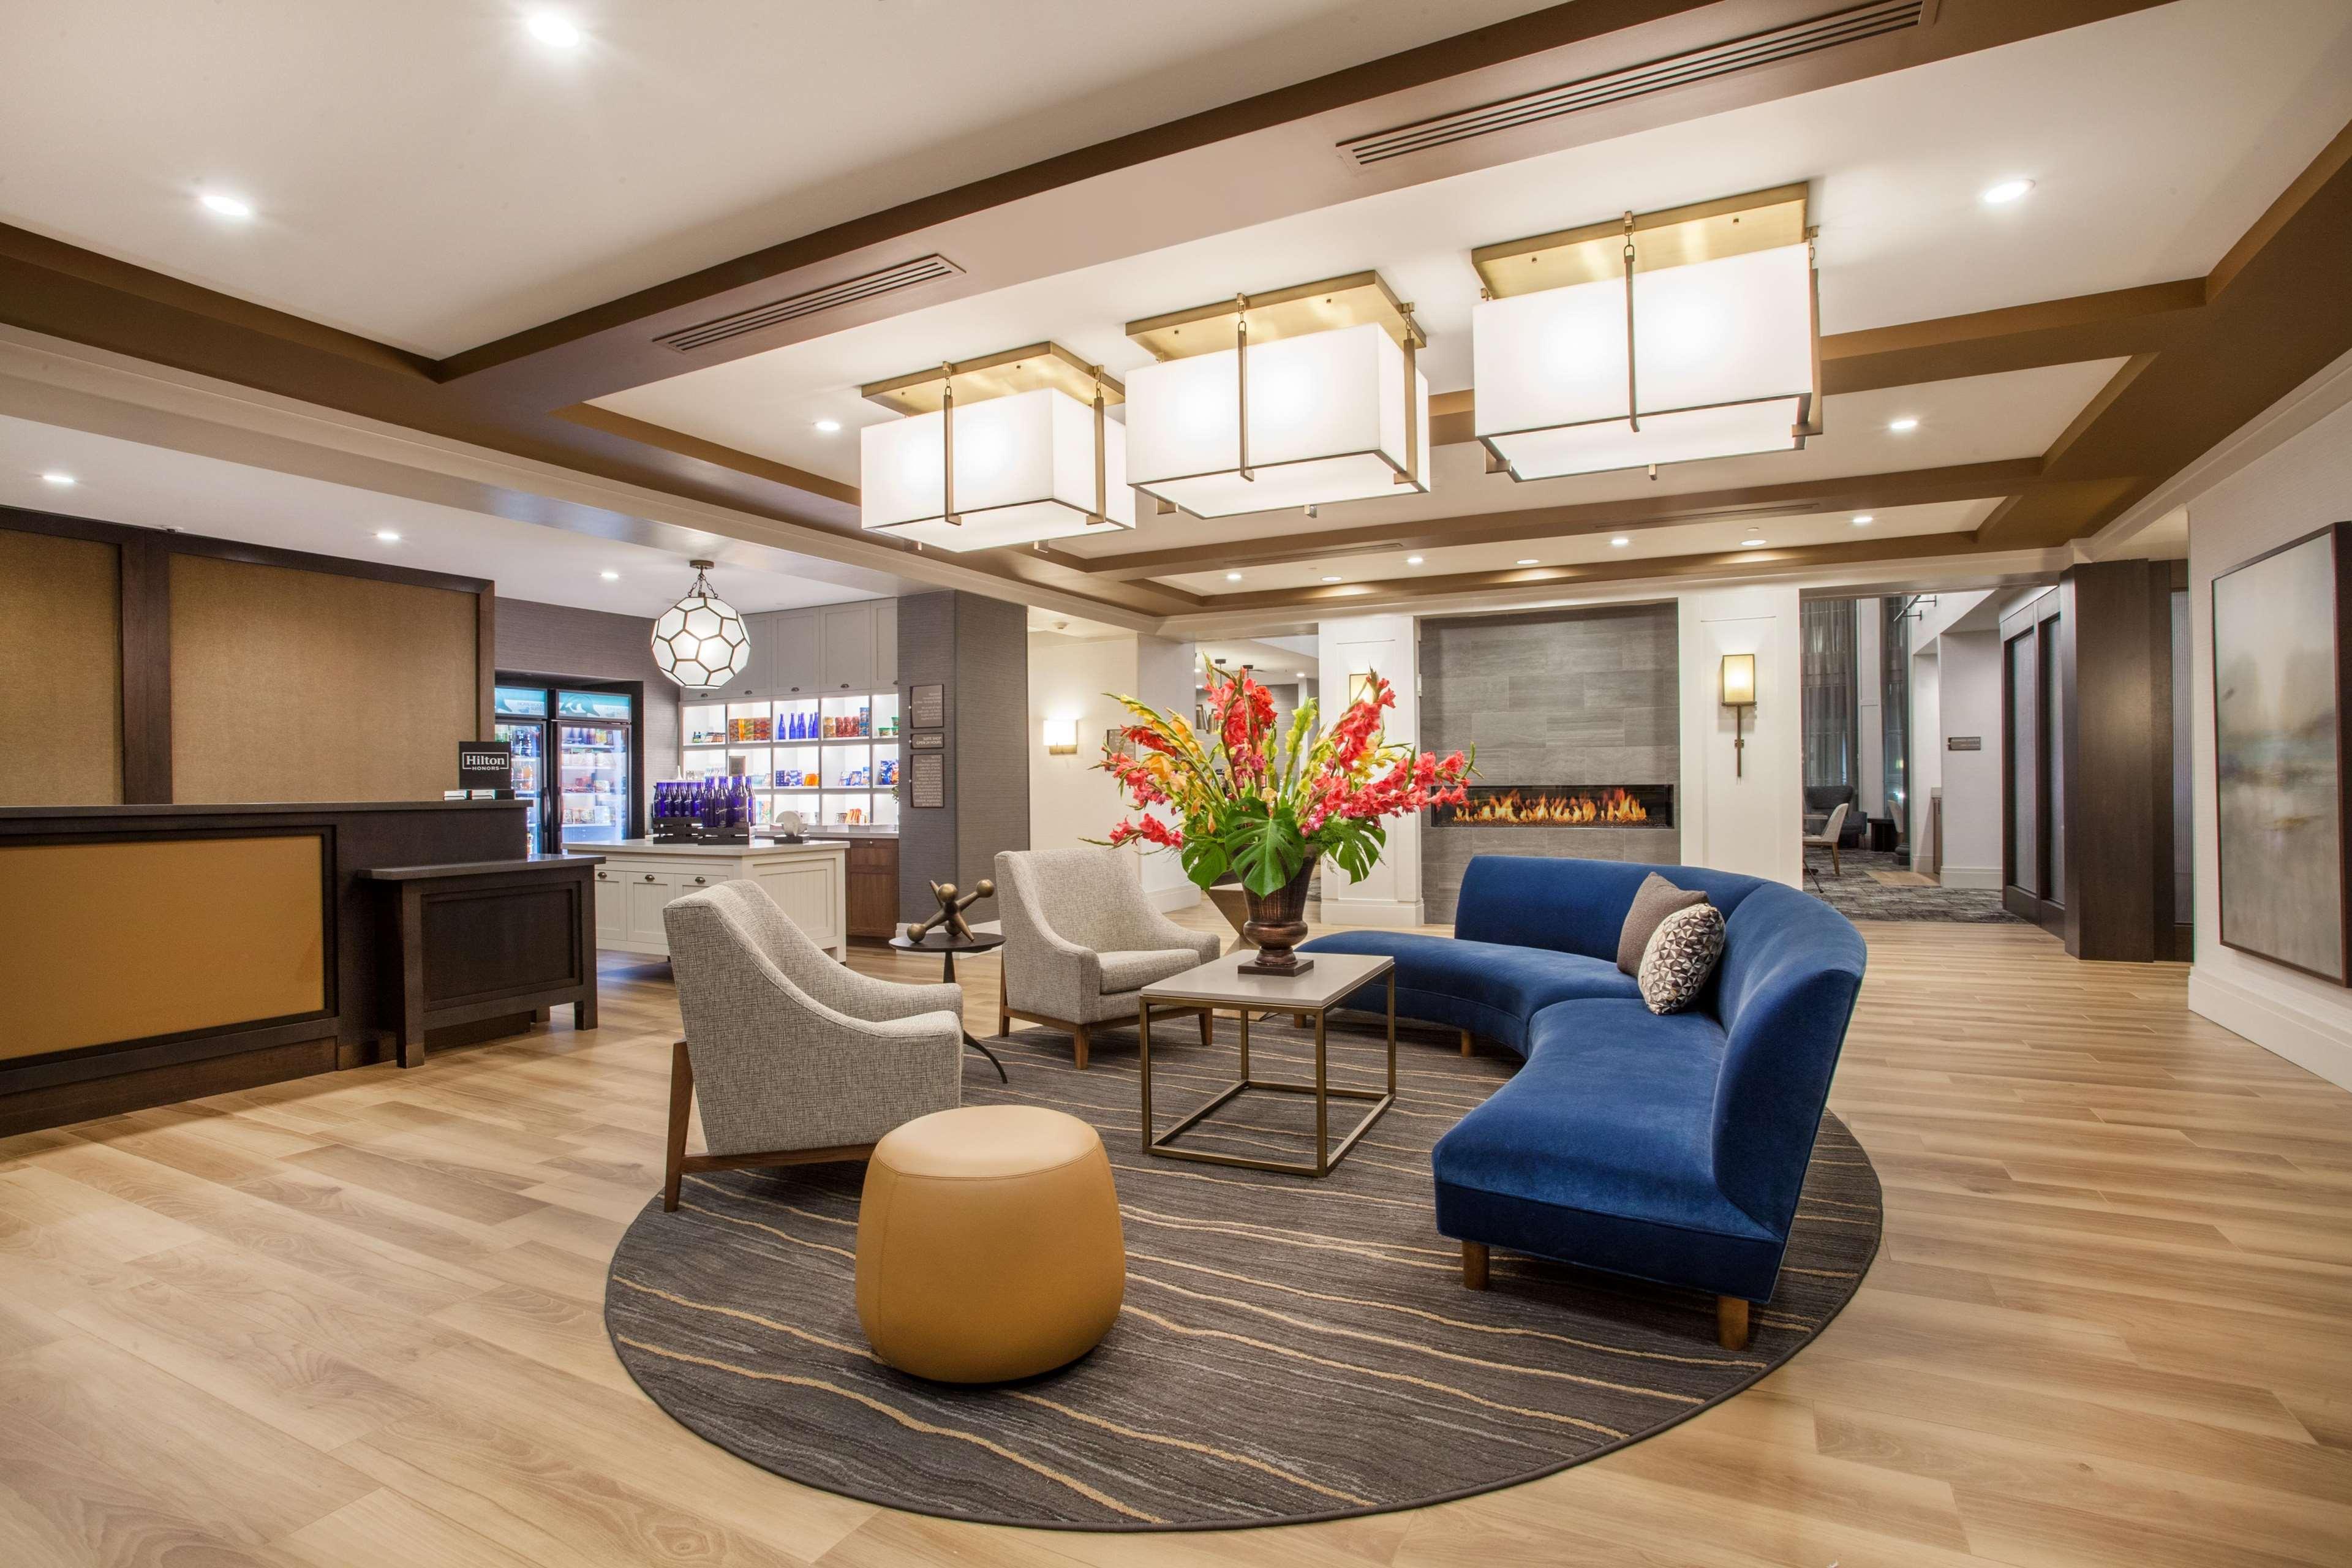 Homewood Suites by Hilton Saratoga Springs image 29